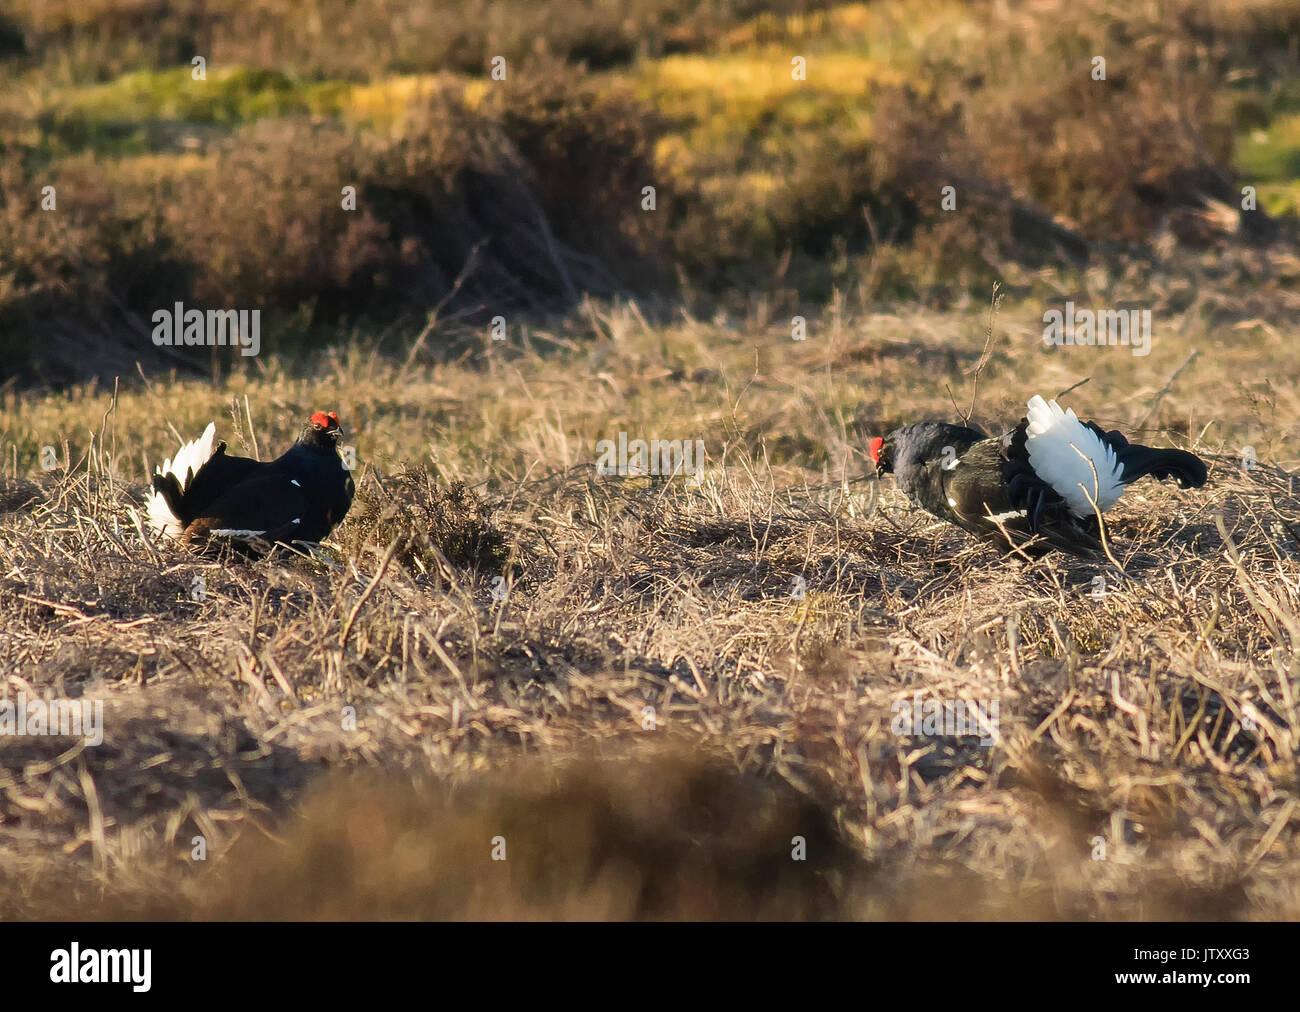 Black Grouse Lekking - Stock Image